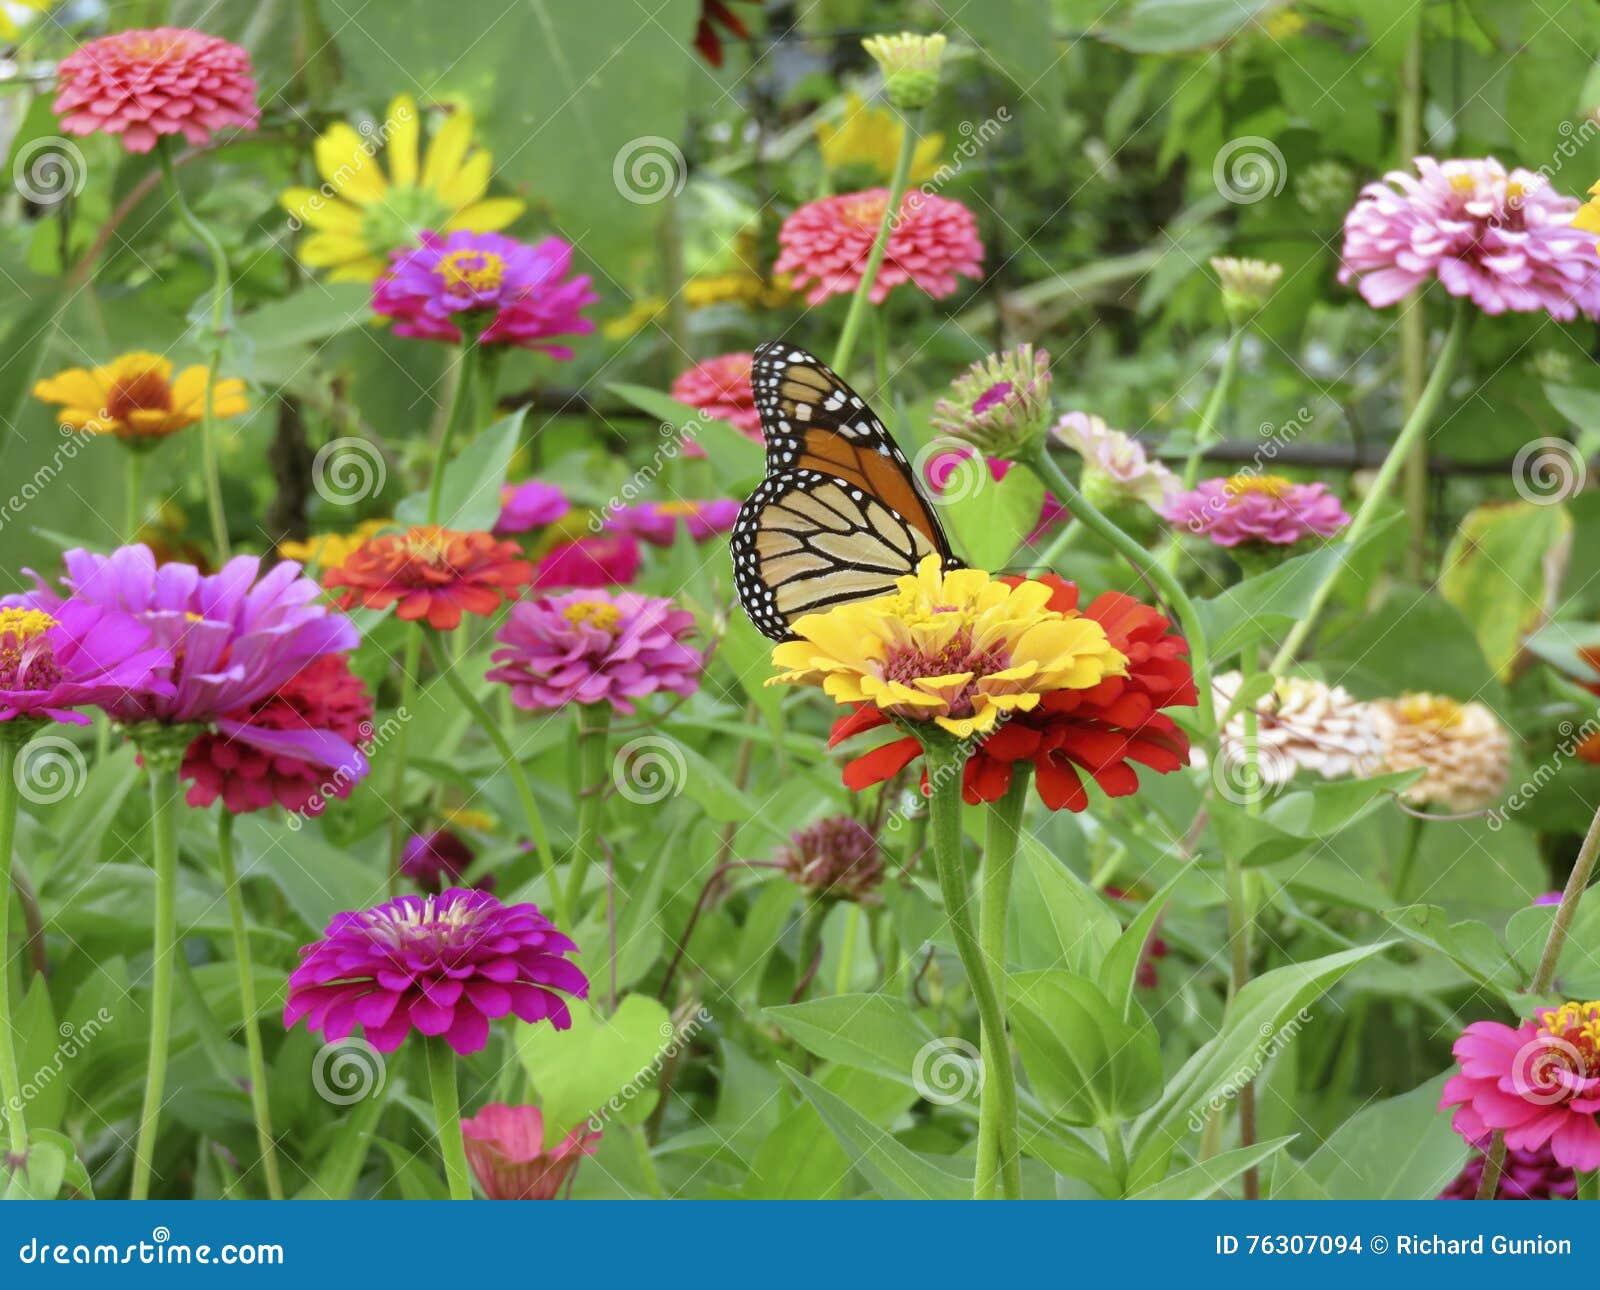 Summer Monarch Butterfly in the Zinnia Garden